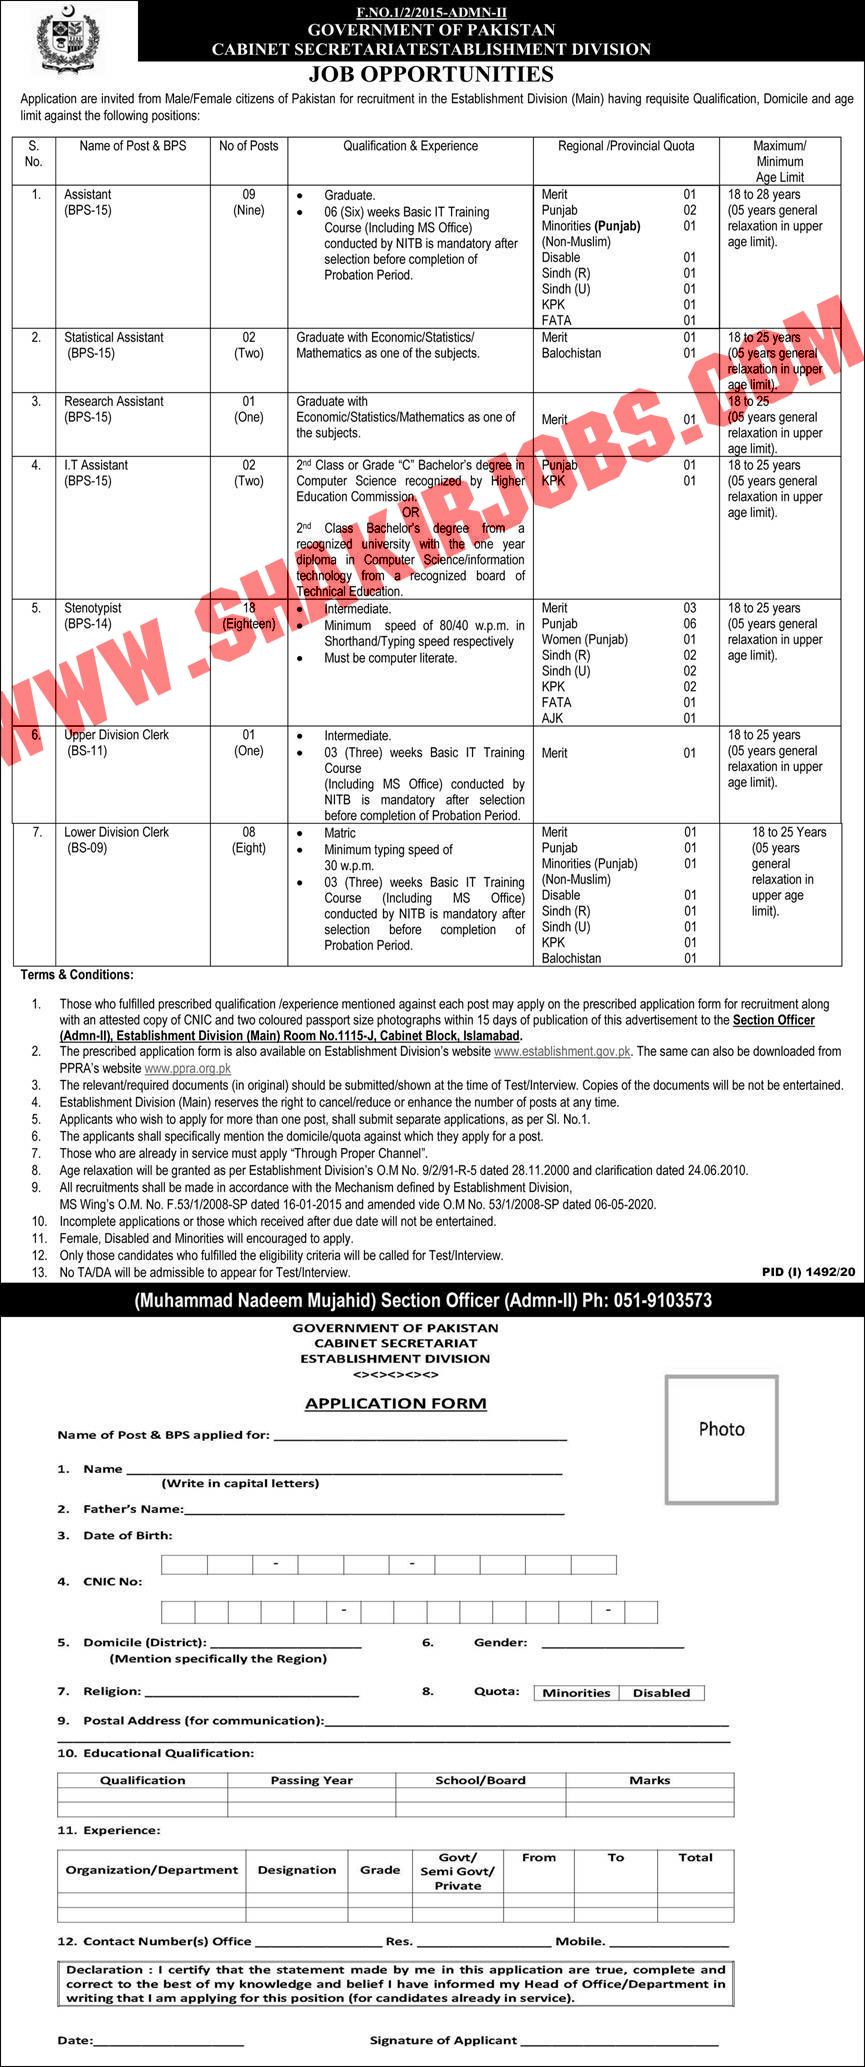 Jobs in Cabinet Secretariat Islamabad Jobs September 2020 (341 Posts)